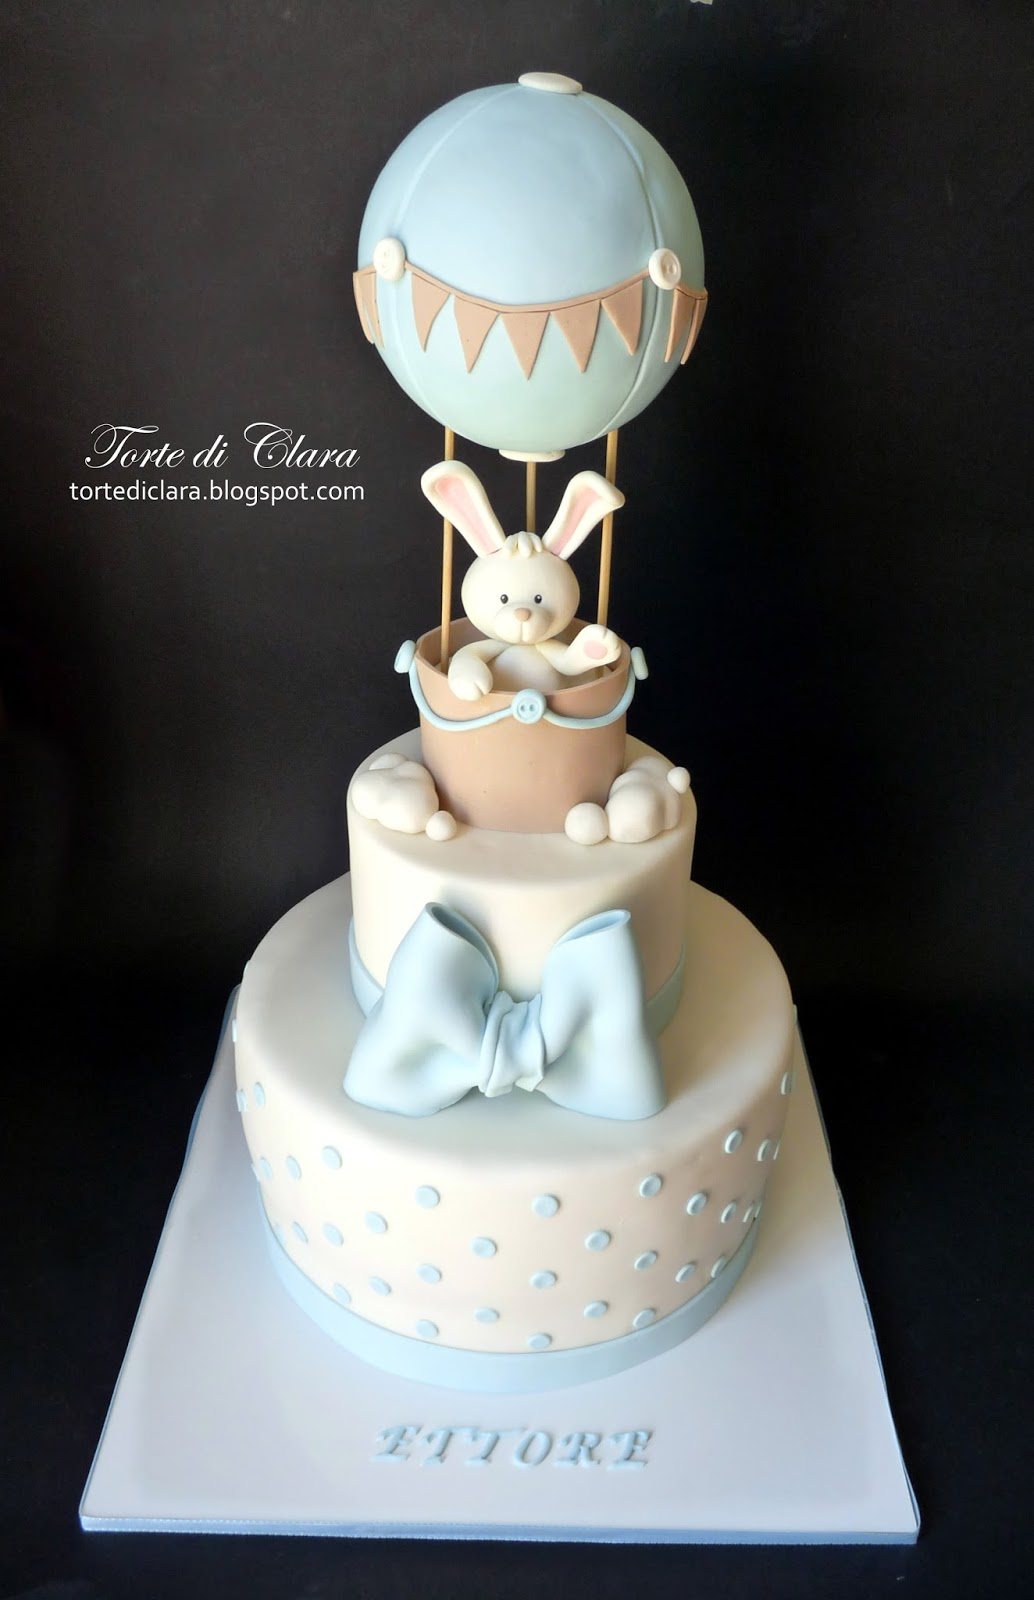 Amato Torte di Clara: Torta Battesimo YL85